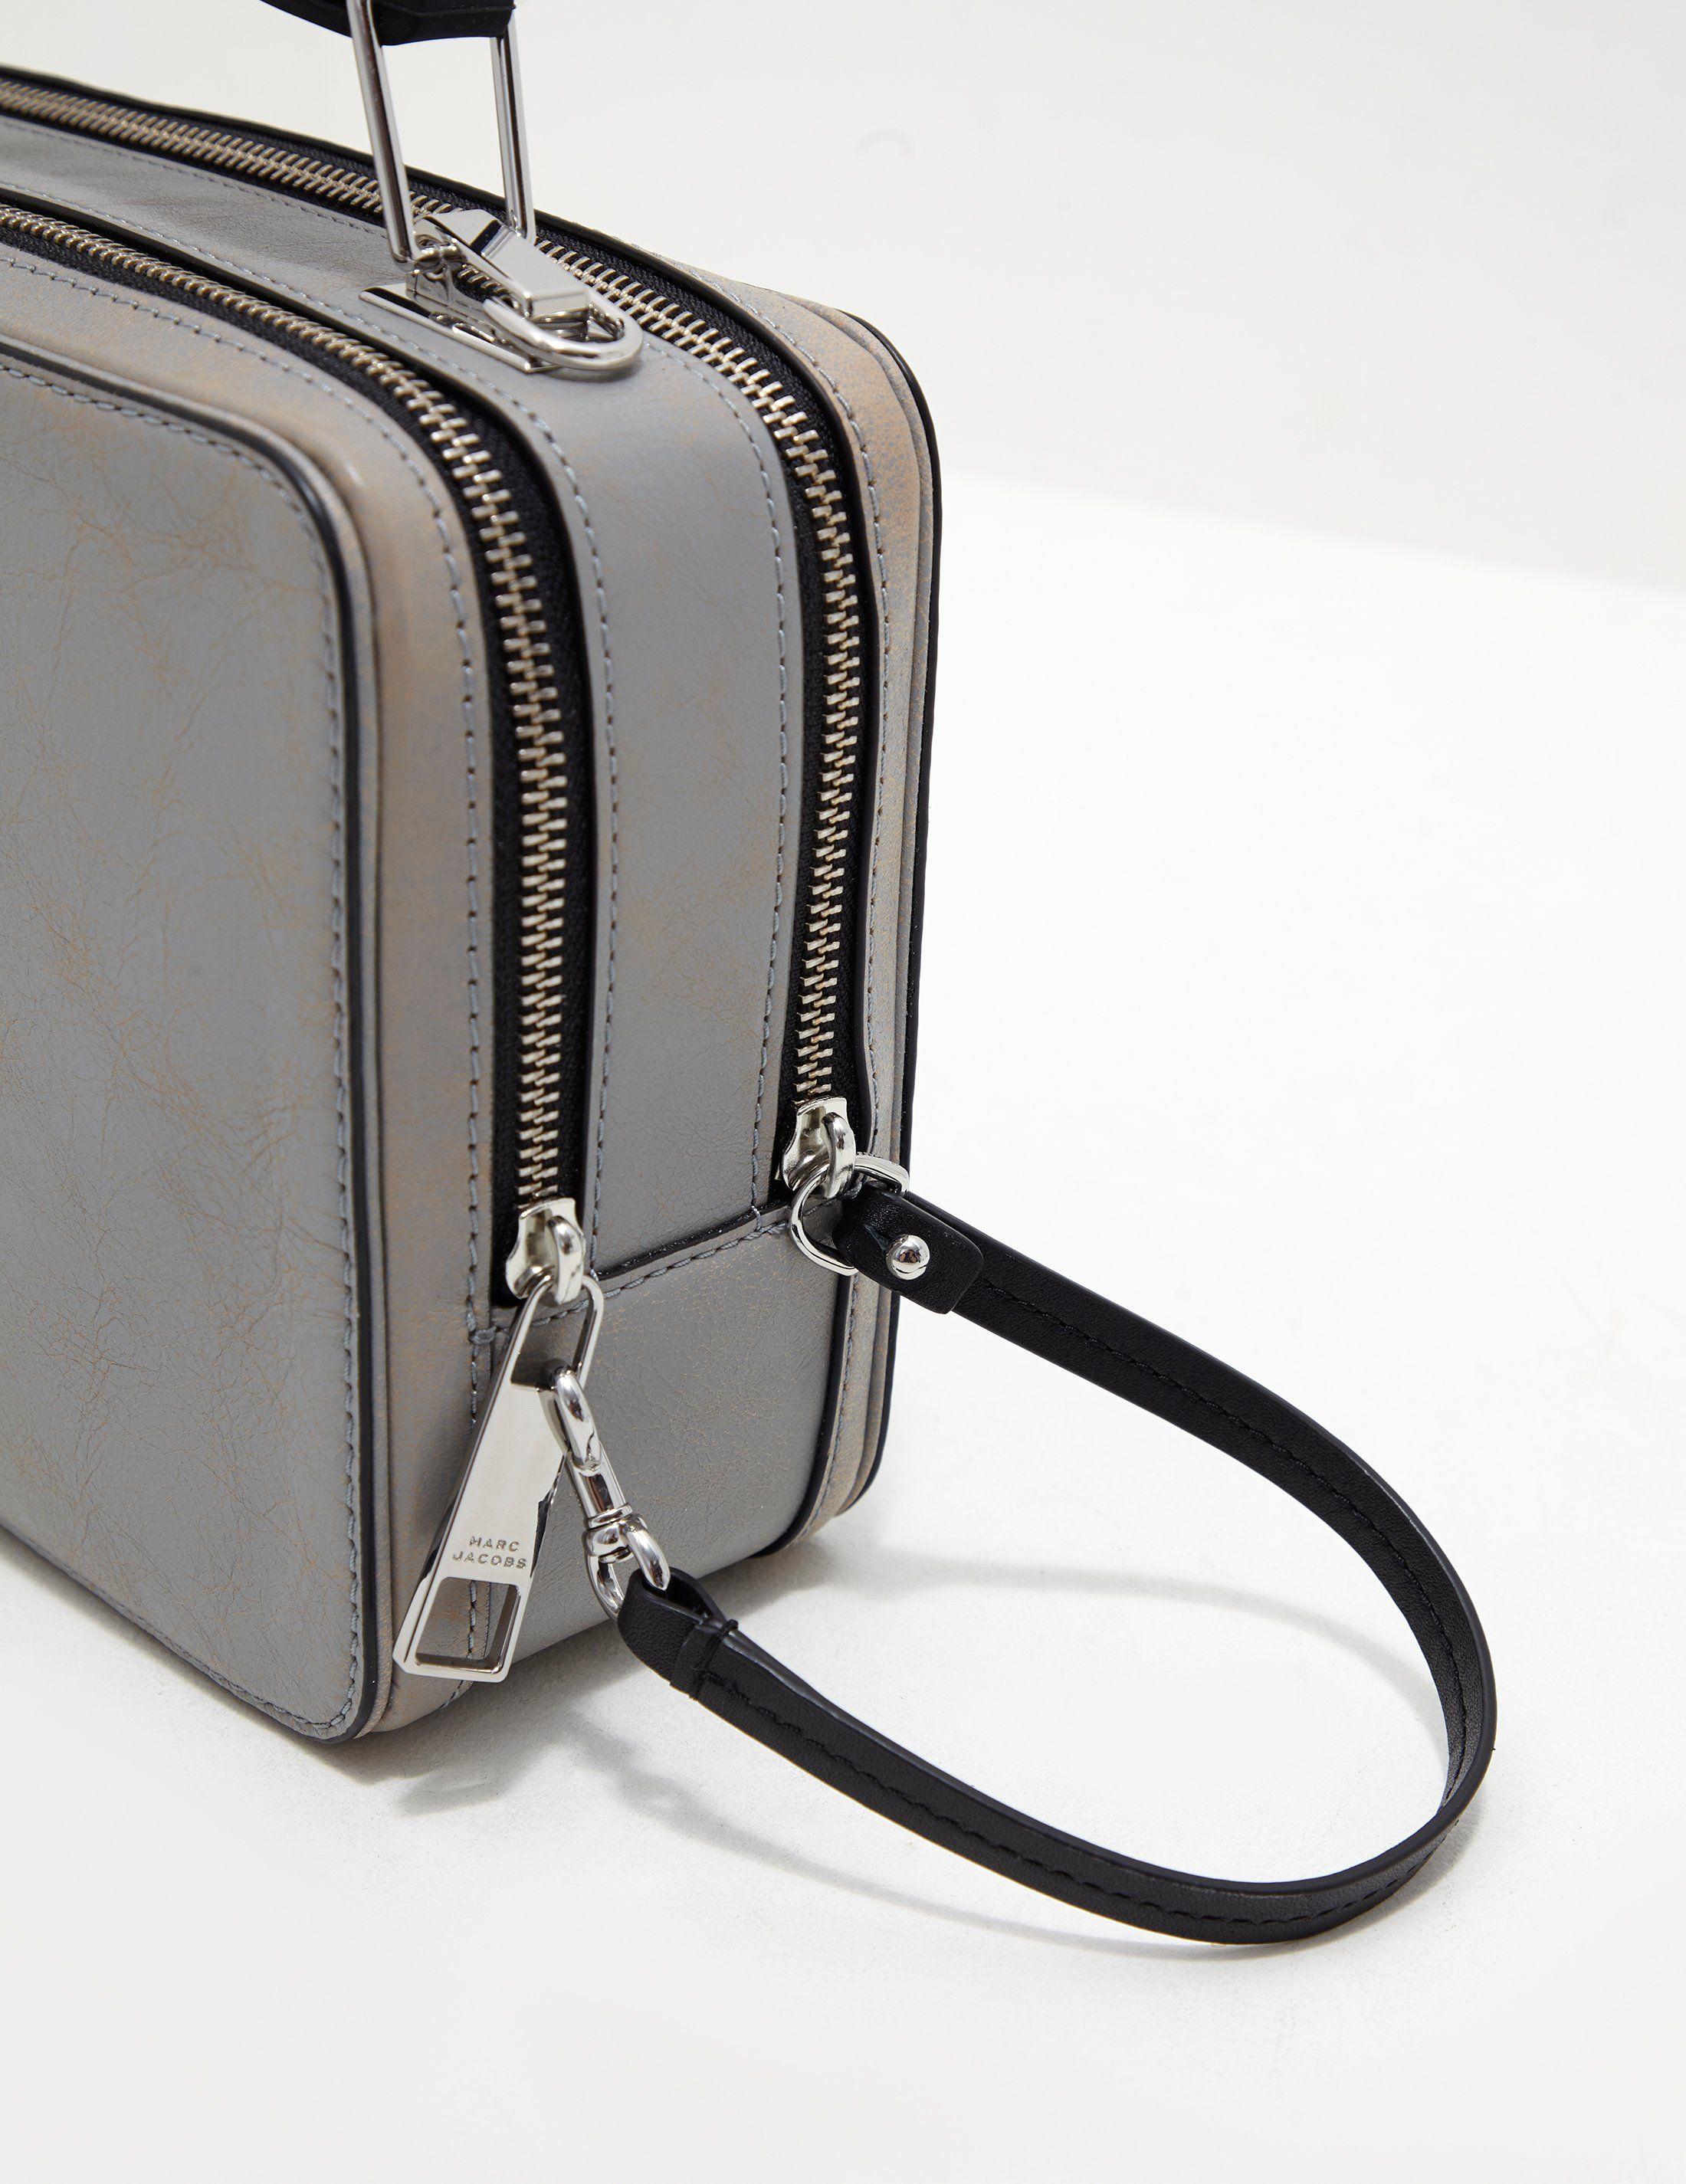 Marc Jacobs The Box Shoulder Bag